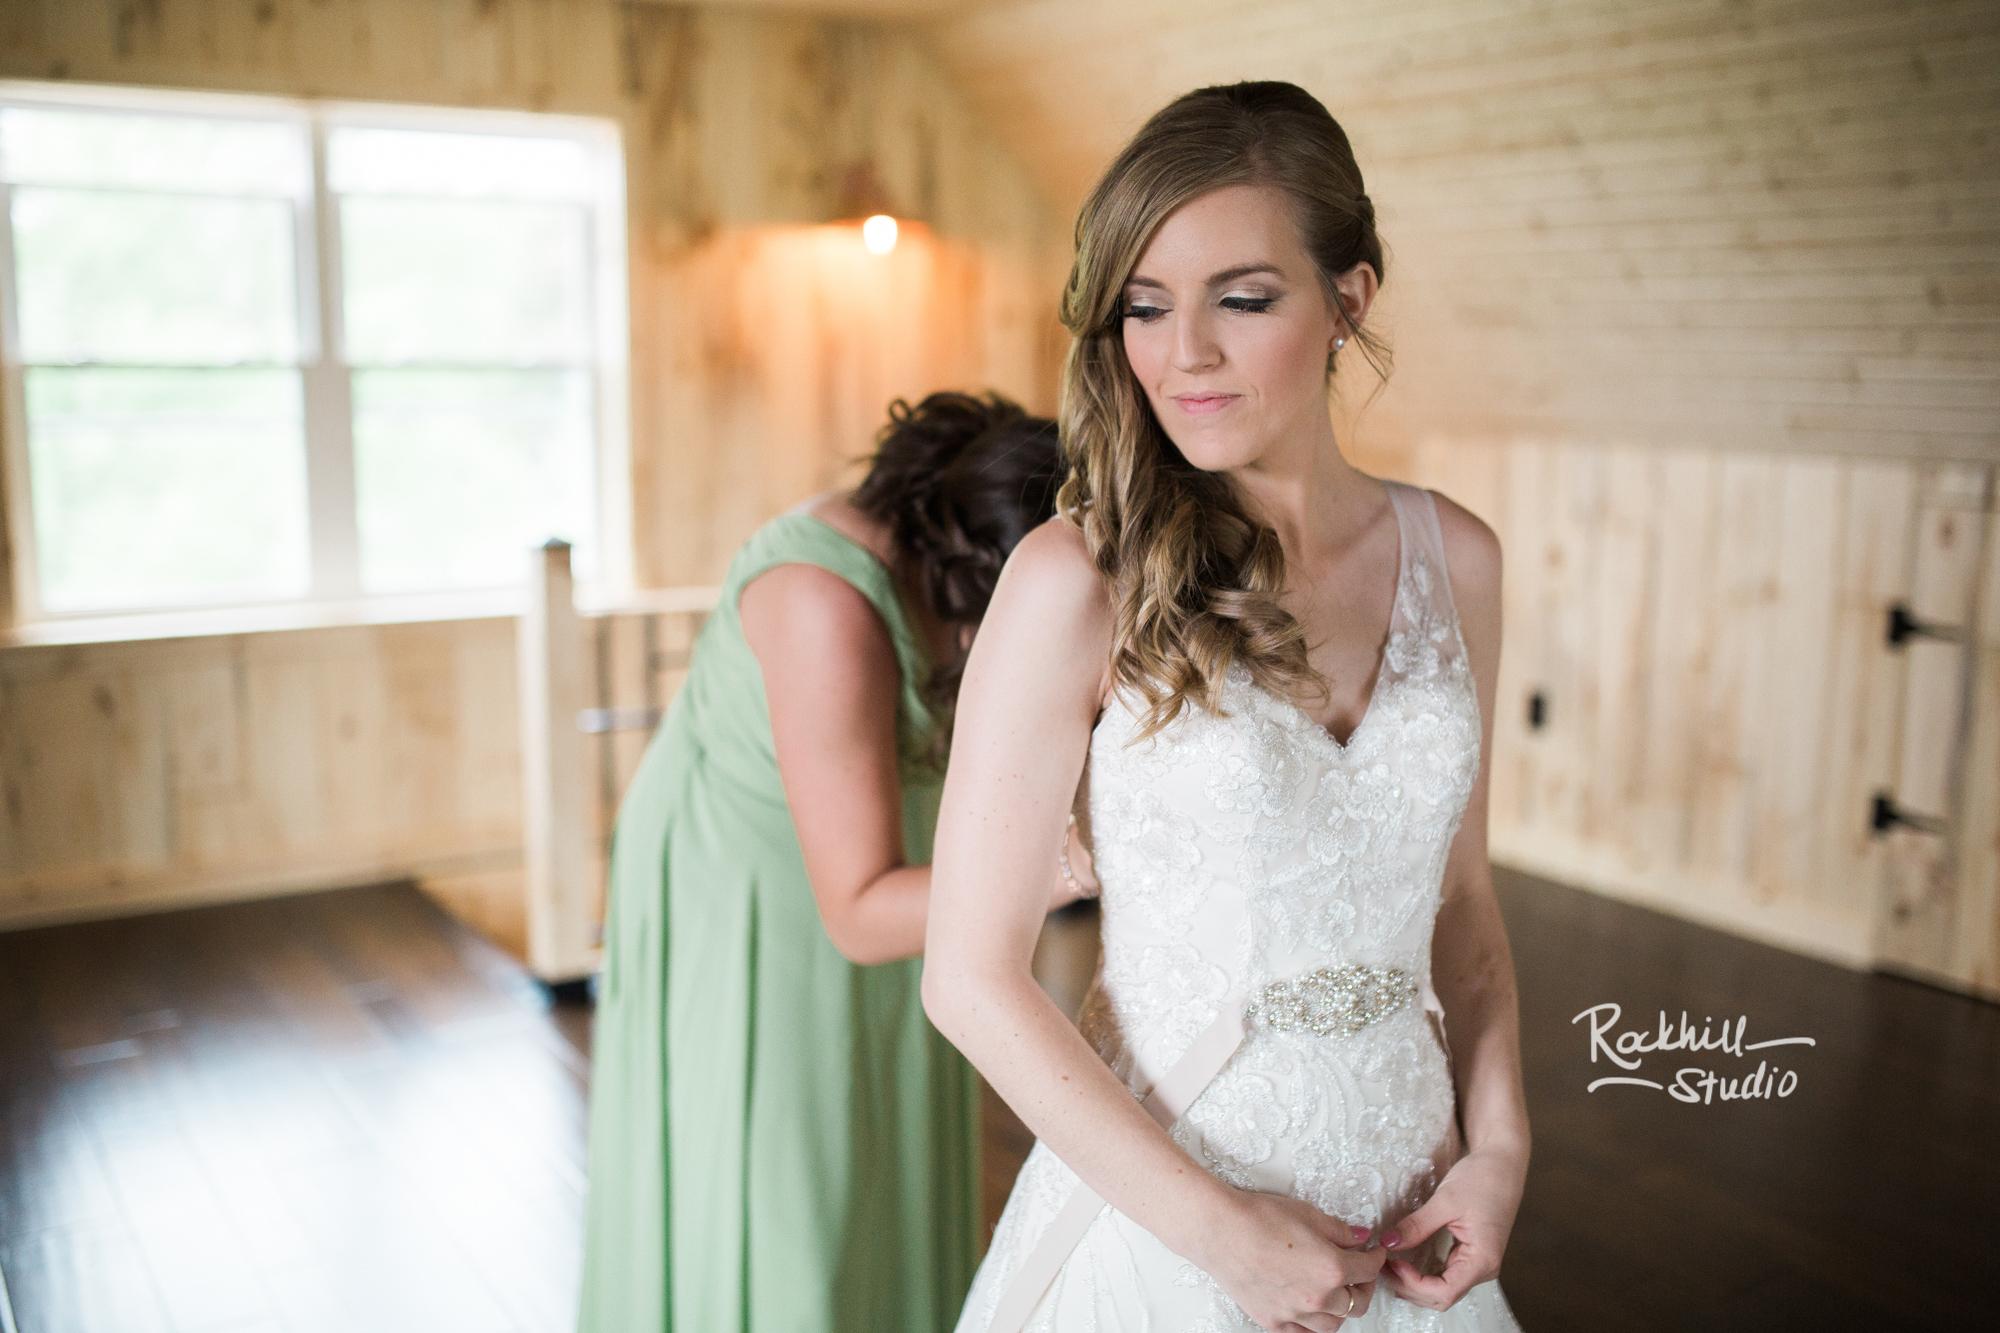 newberry-michigan-wedding-upper-peninsula-spring-photography-rockhill-ee-5.jpg